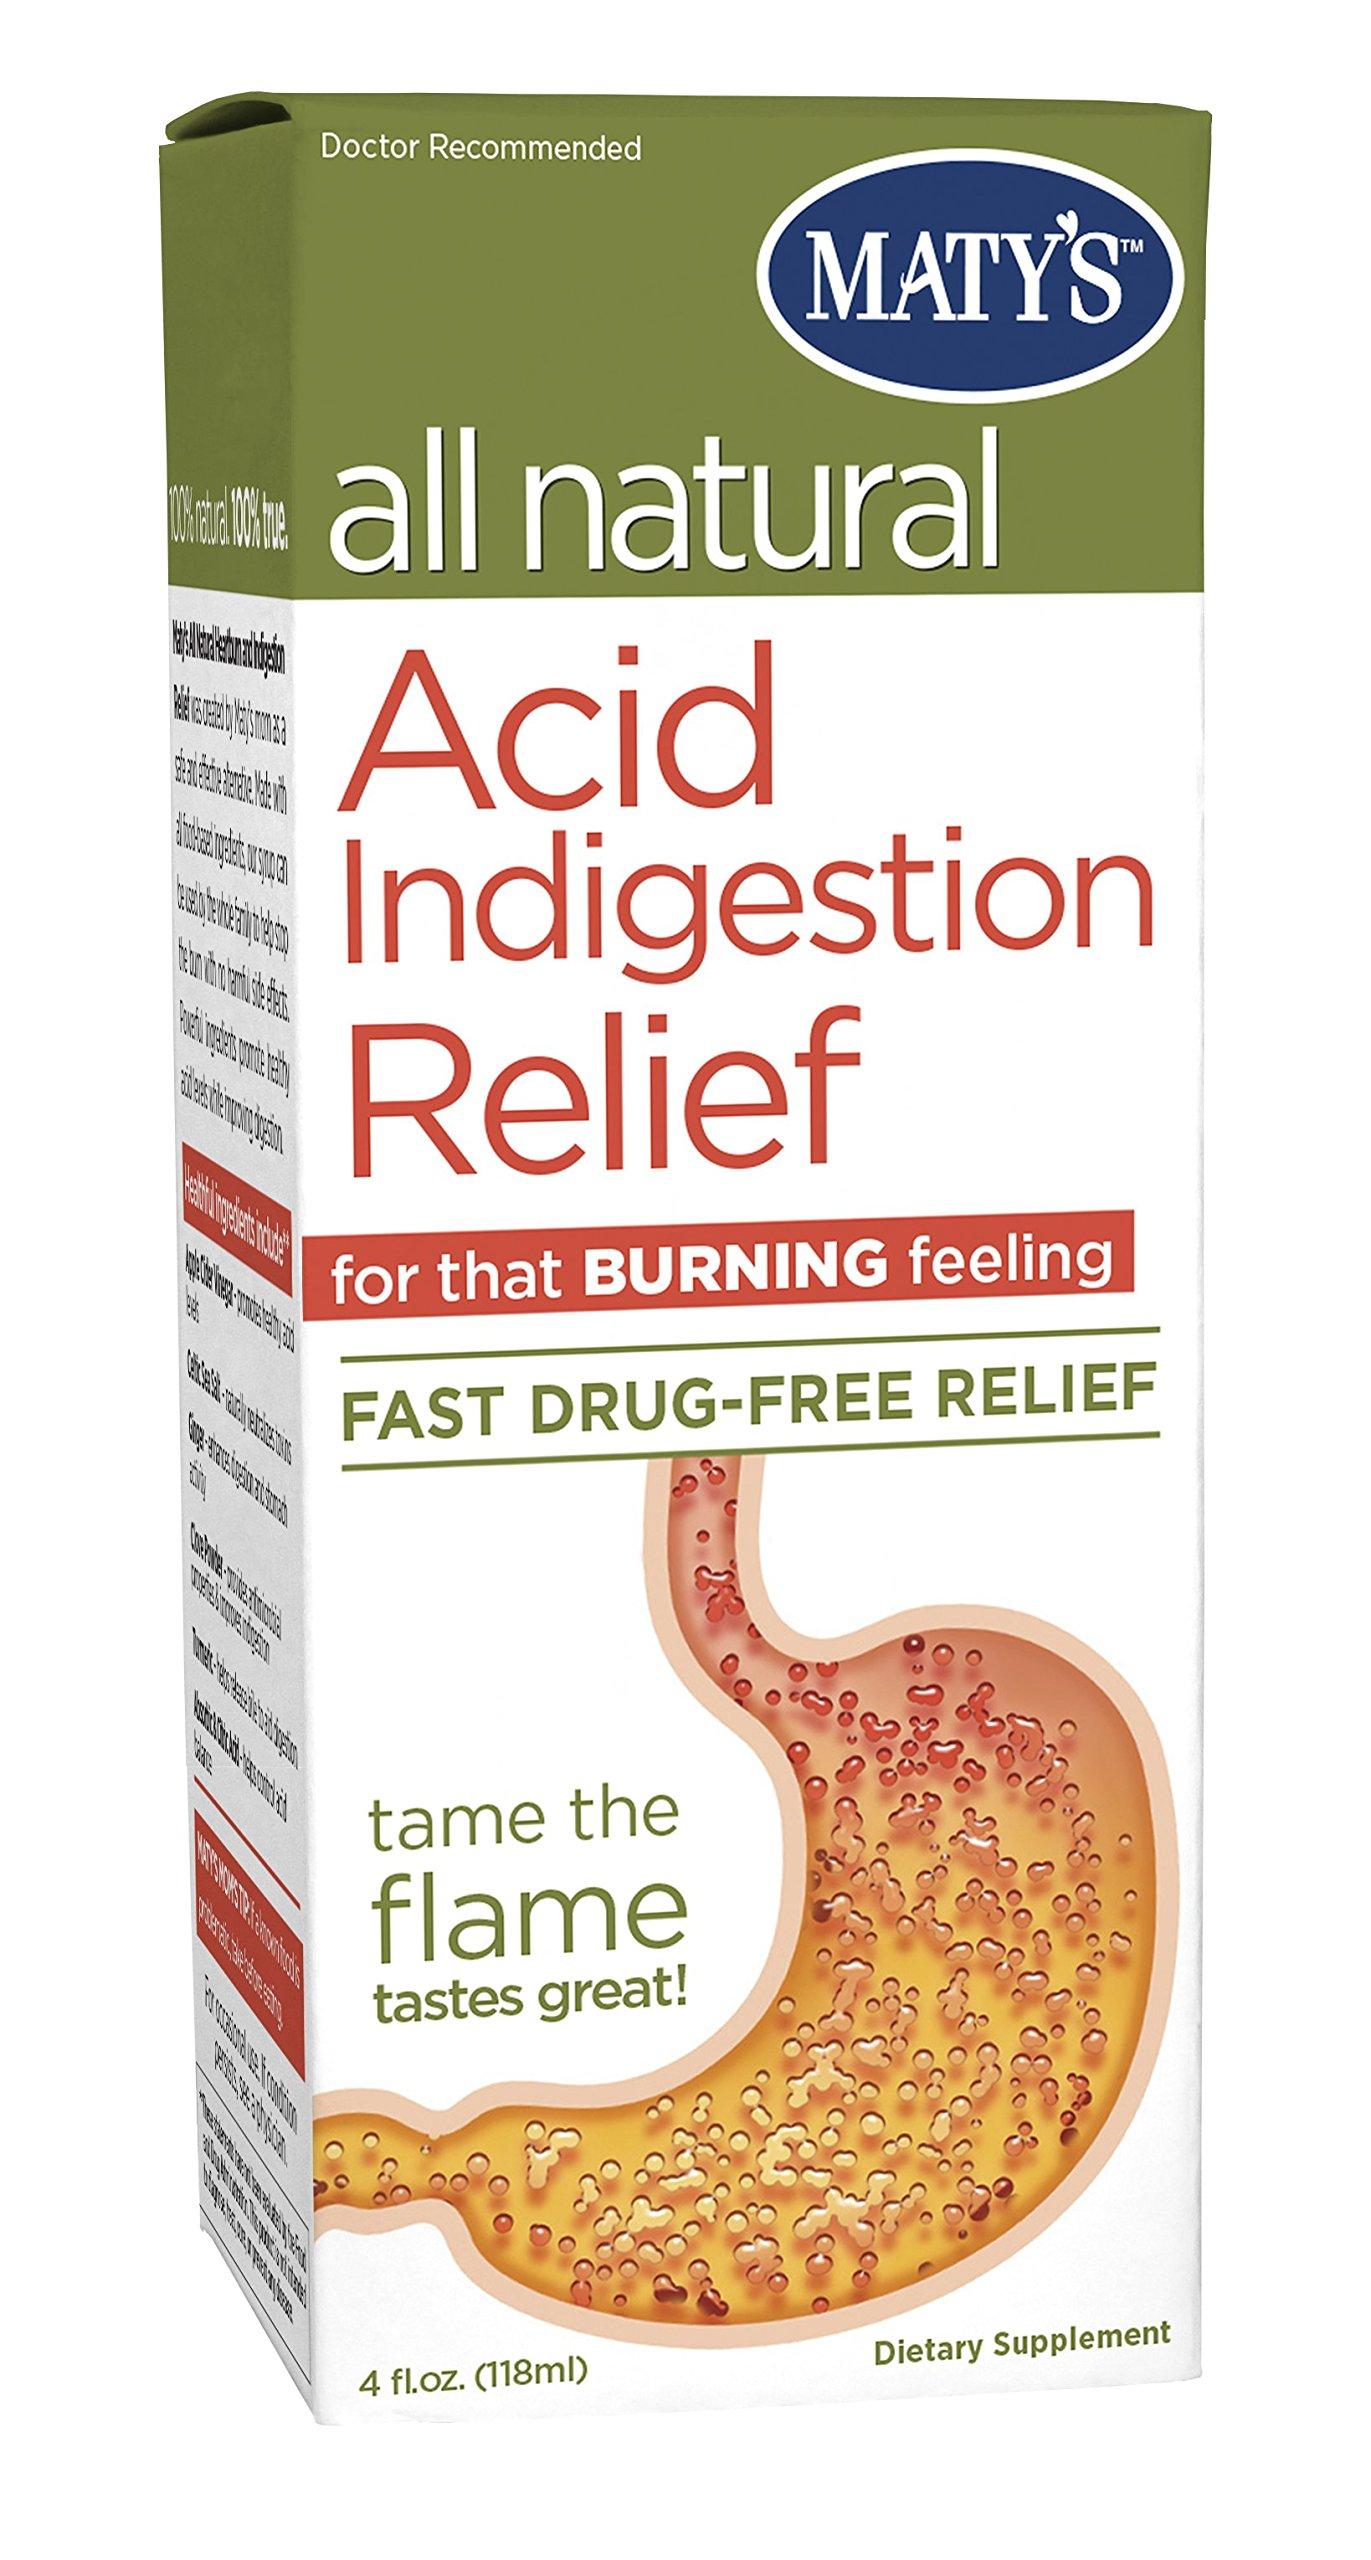 Matys All Natural Acid Indigestion Relief Antacid 4.0 Fluid Ounce